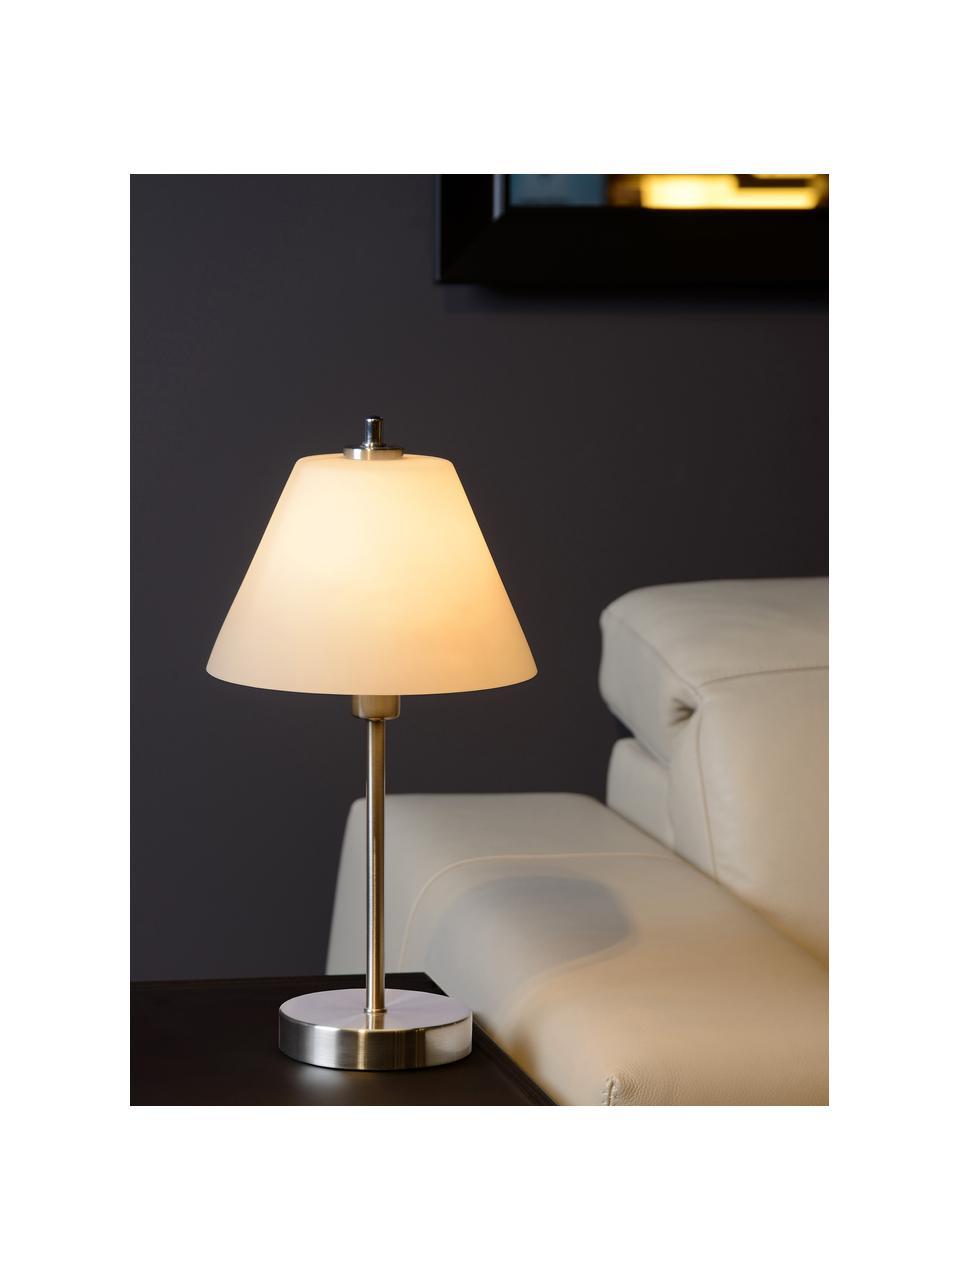 Dimmbare Tischlampe Touch mit Glasschirm, Lampenschirm: Opalglas, Lampenfuß: Metall, Chrom, satiniert, Opalweiß, Ø 22 x H 42 cm